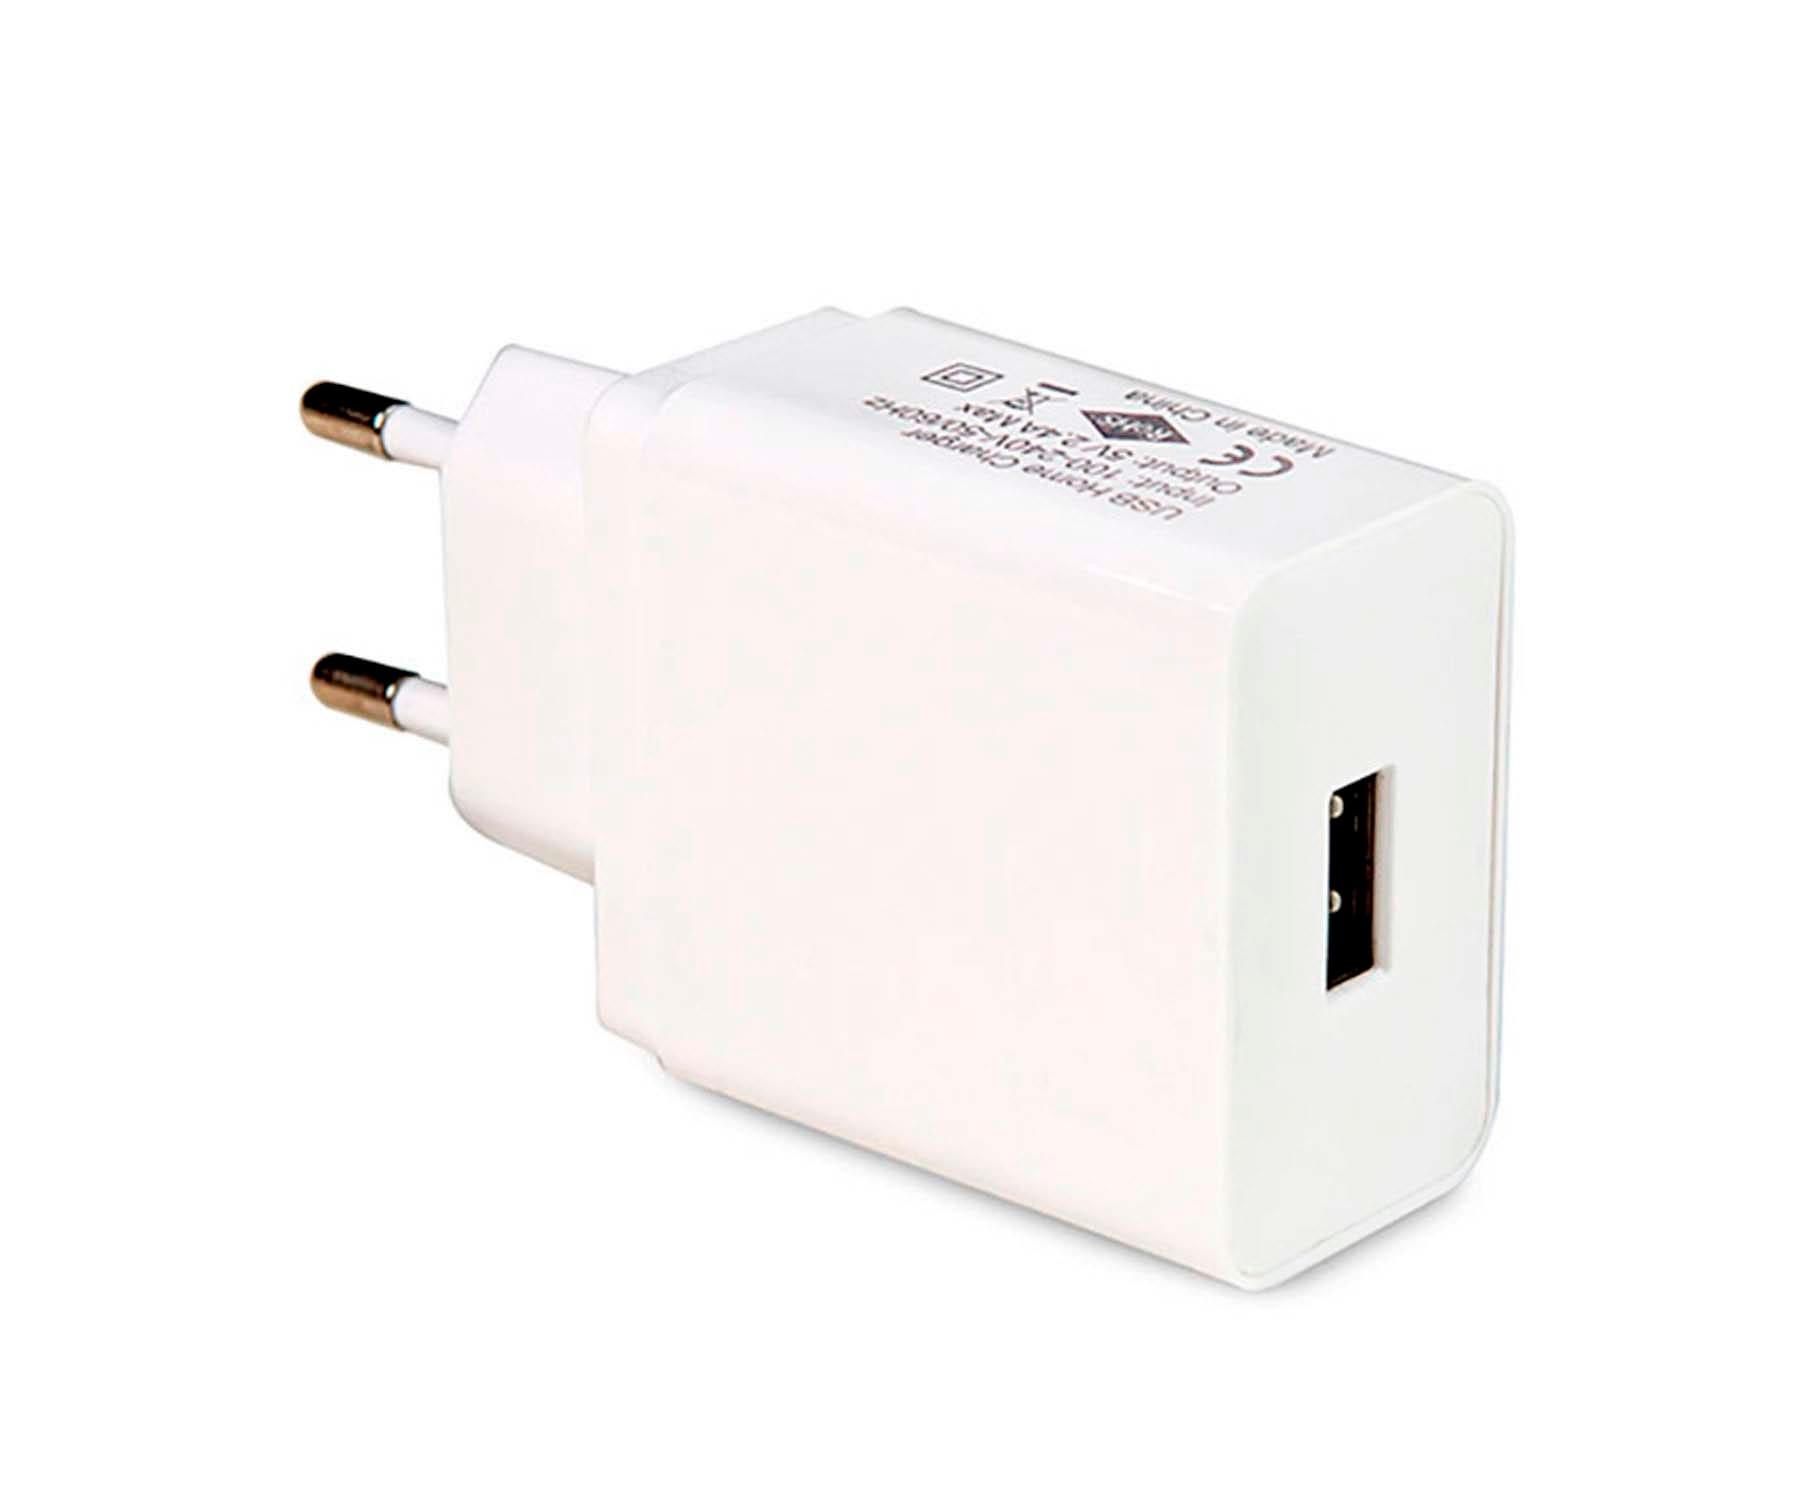 VSMART G010214 BLANCO QUICK CHARGE 3.0 USB R1/L1